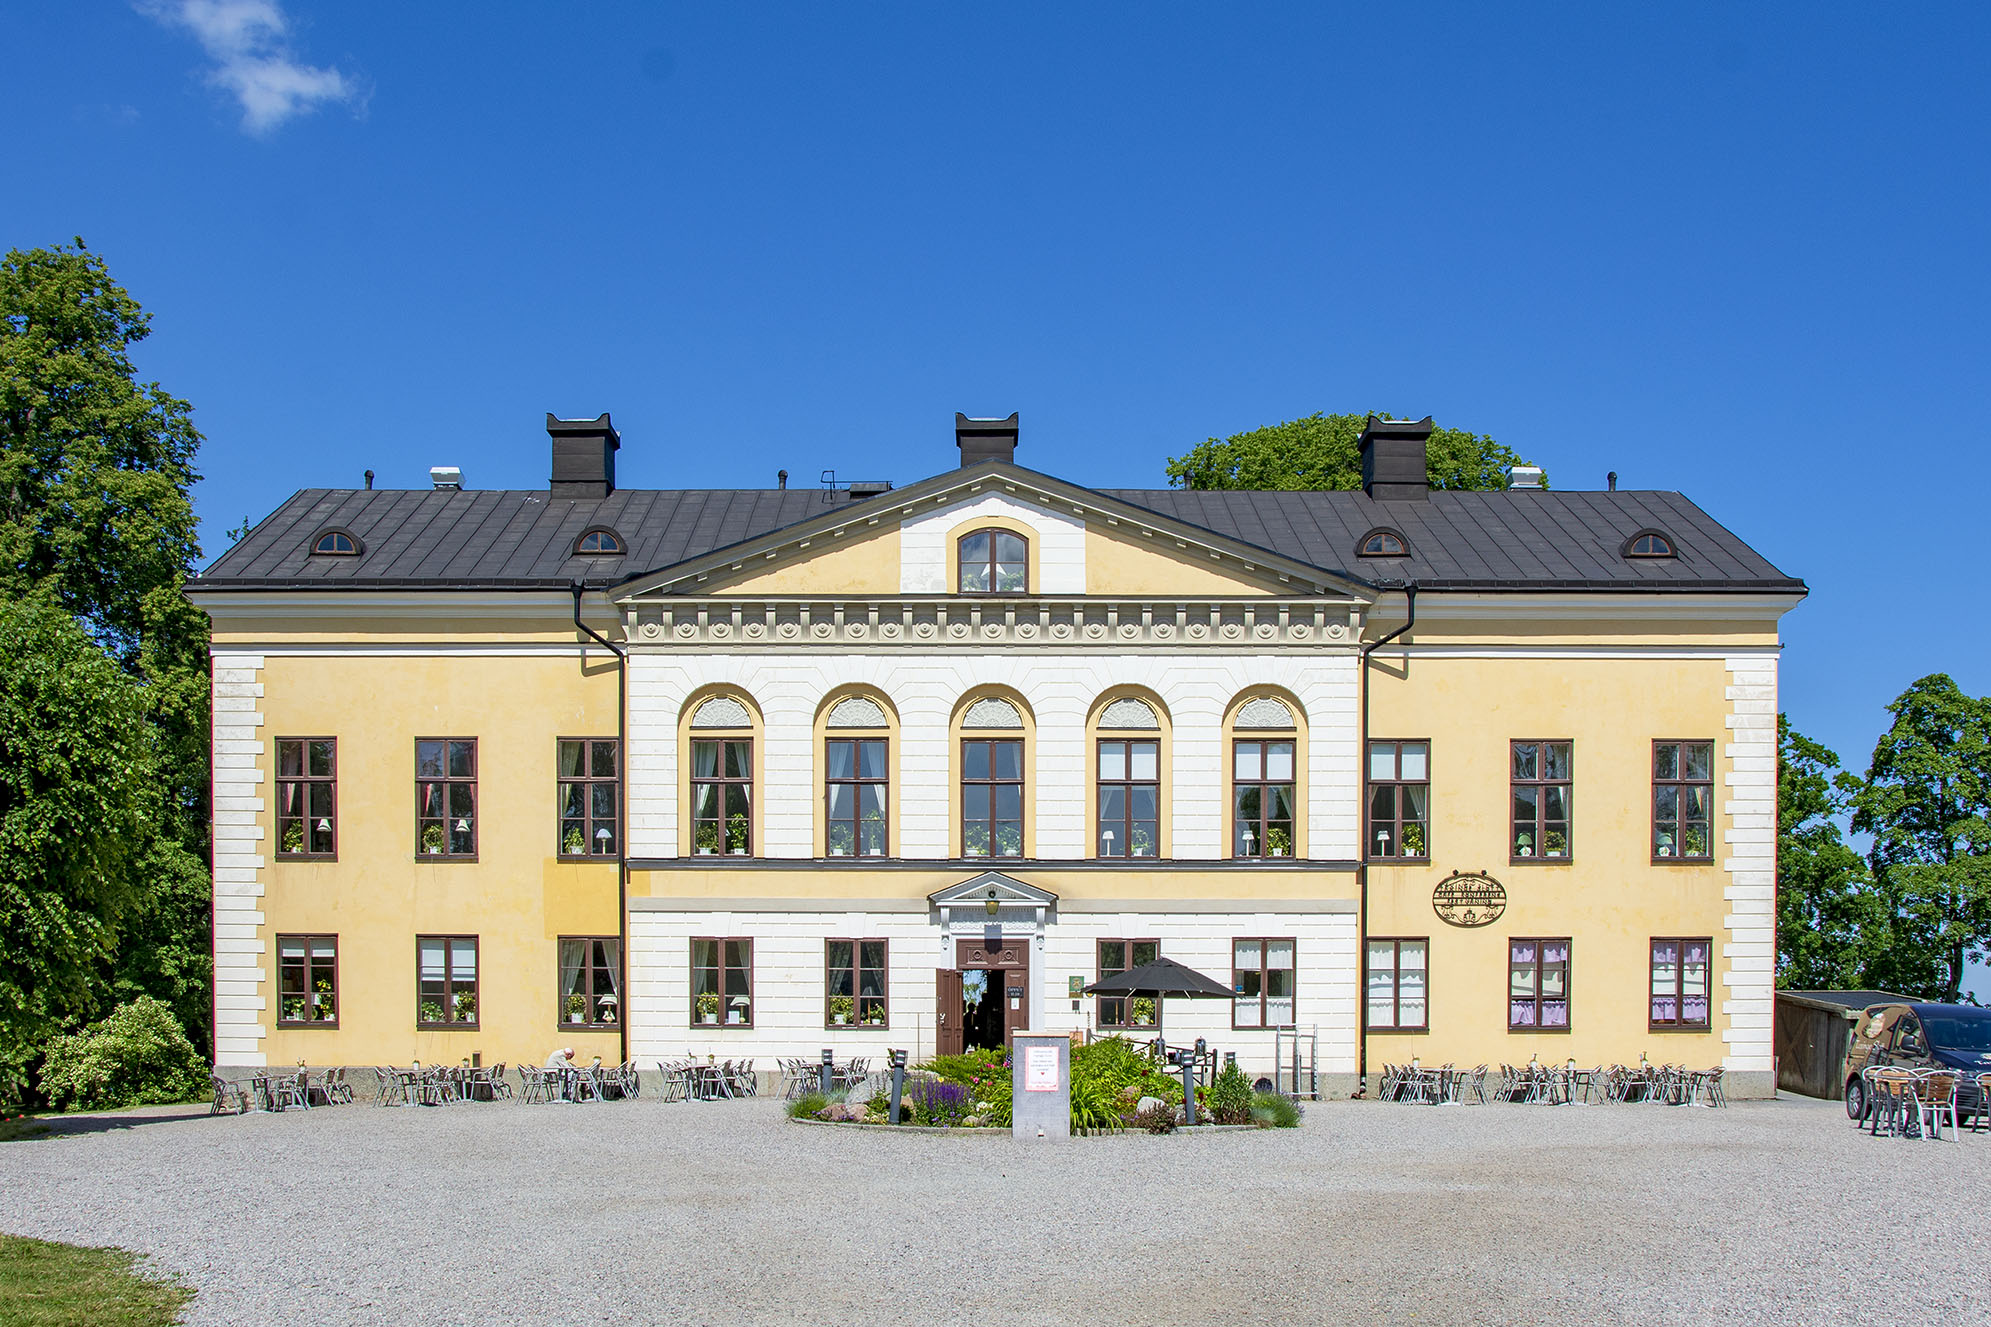 Taxinge slott kakslottet Två timmar med bil från Stockholm